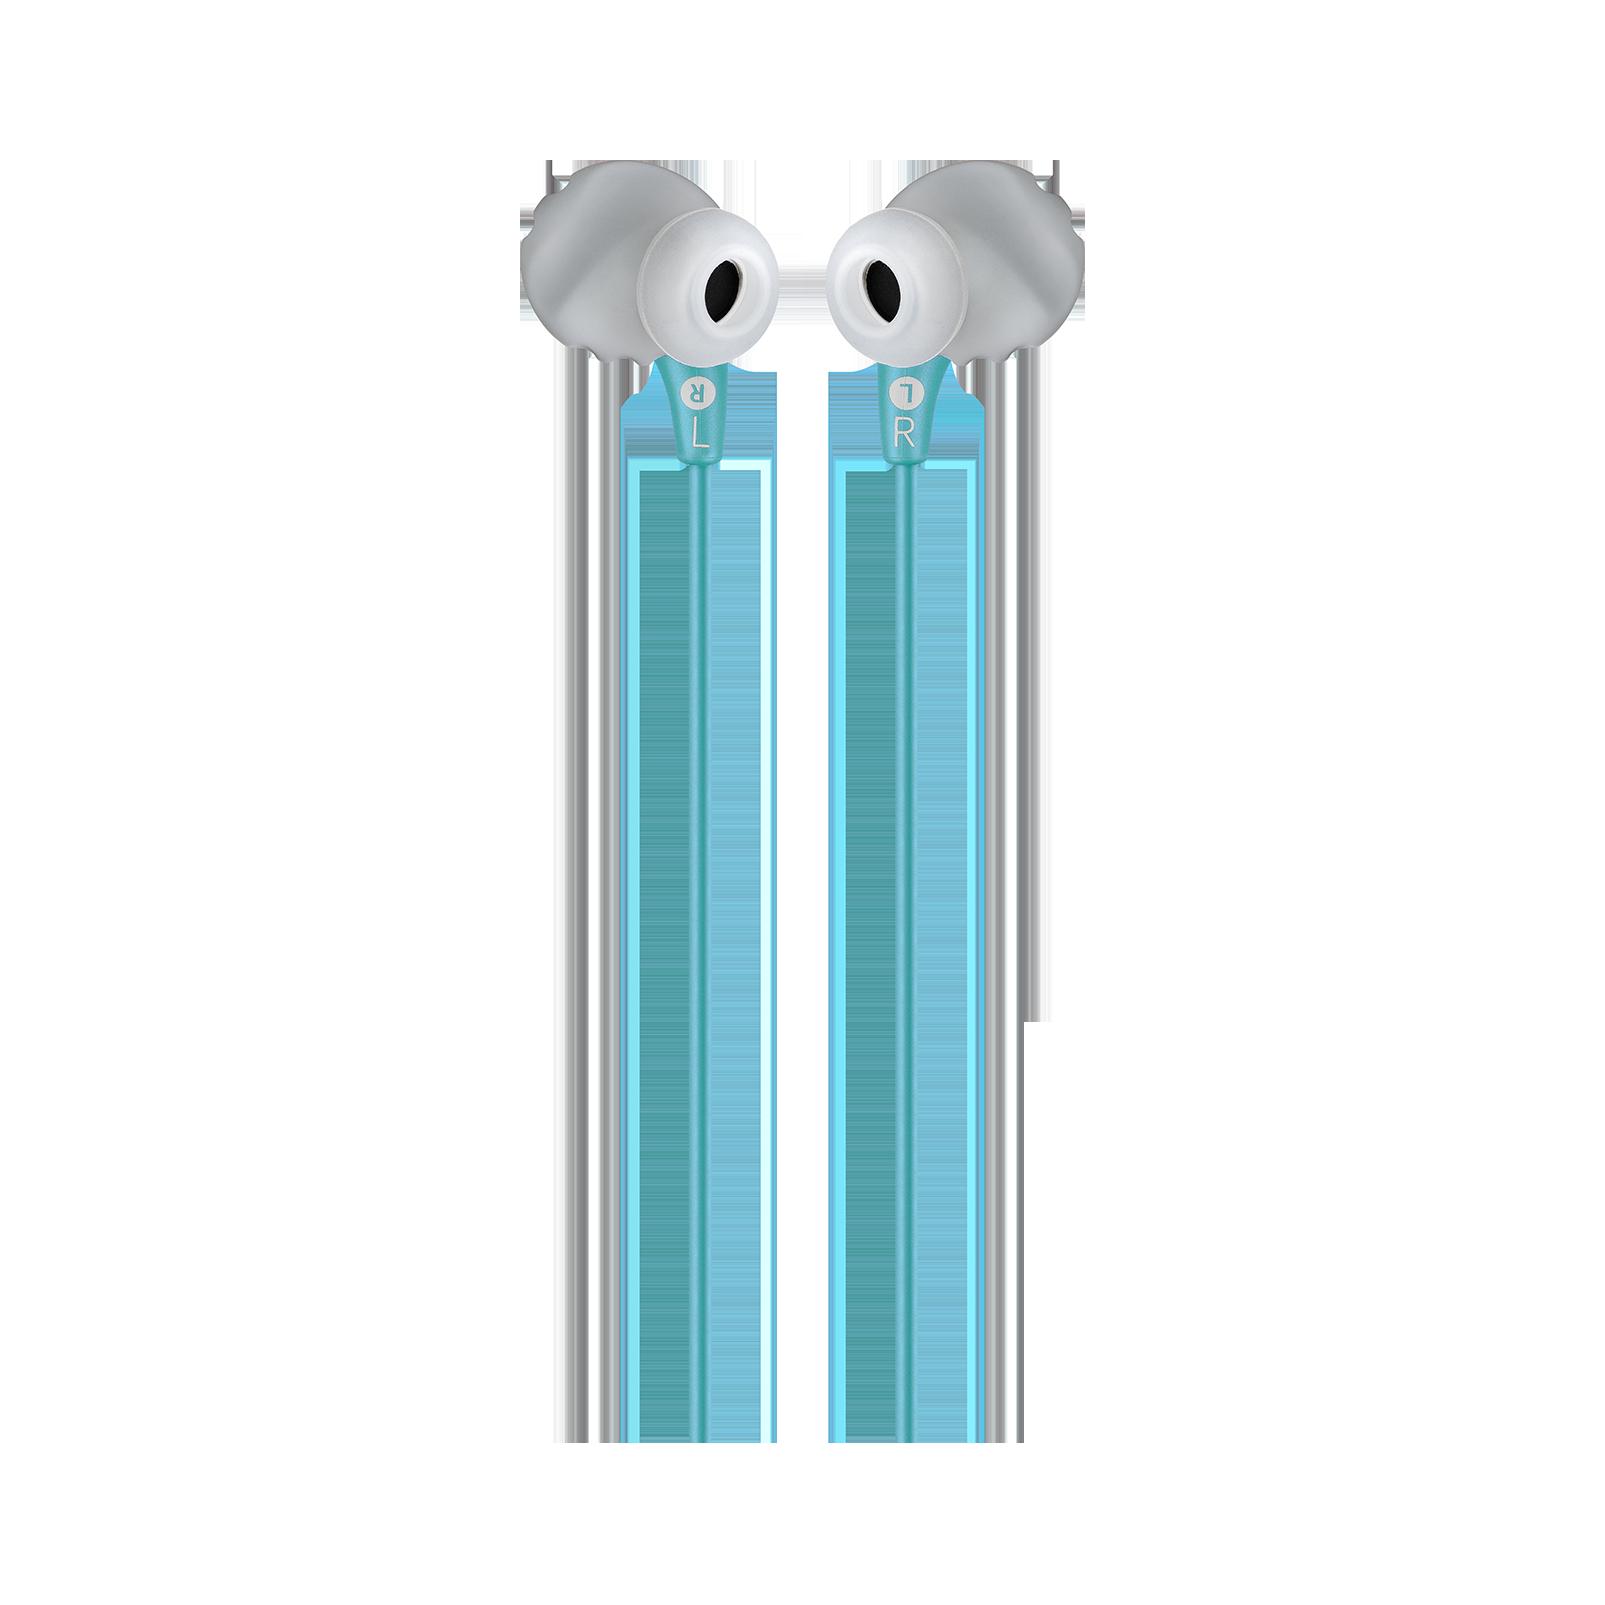 JBL Endurance RUN - Teal - Sweatproof Wired Sport In-Ear Headphones - Back